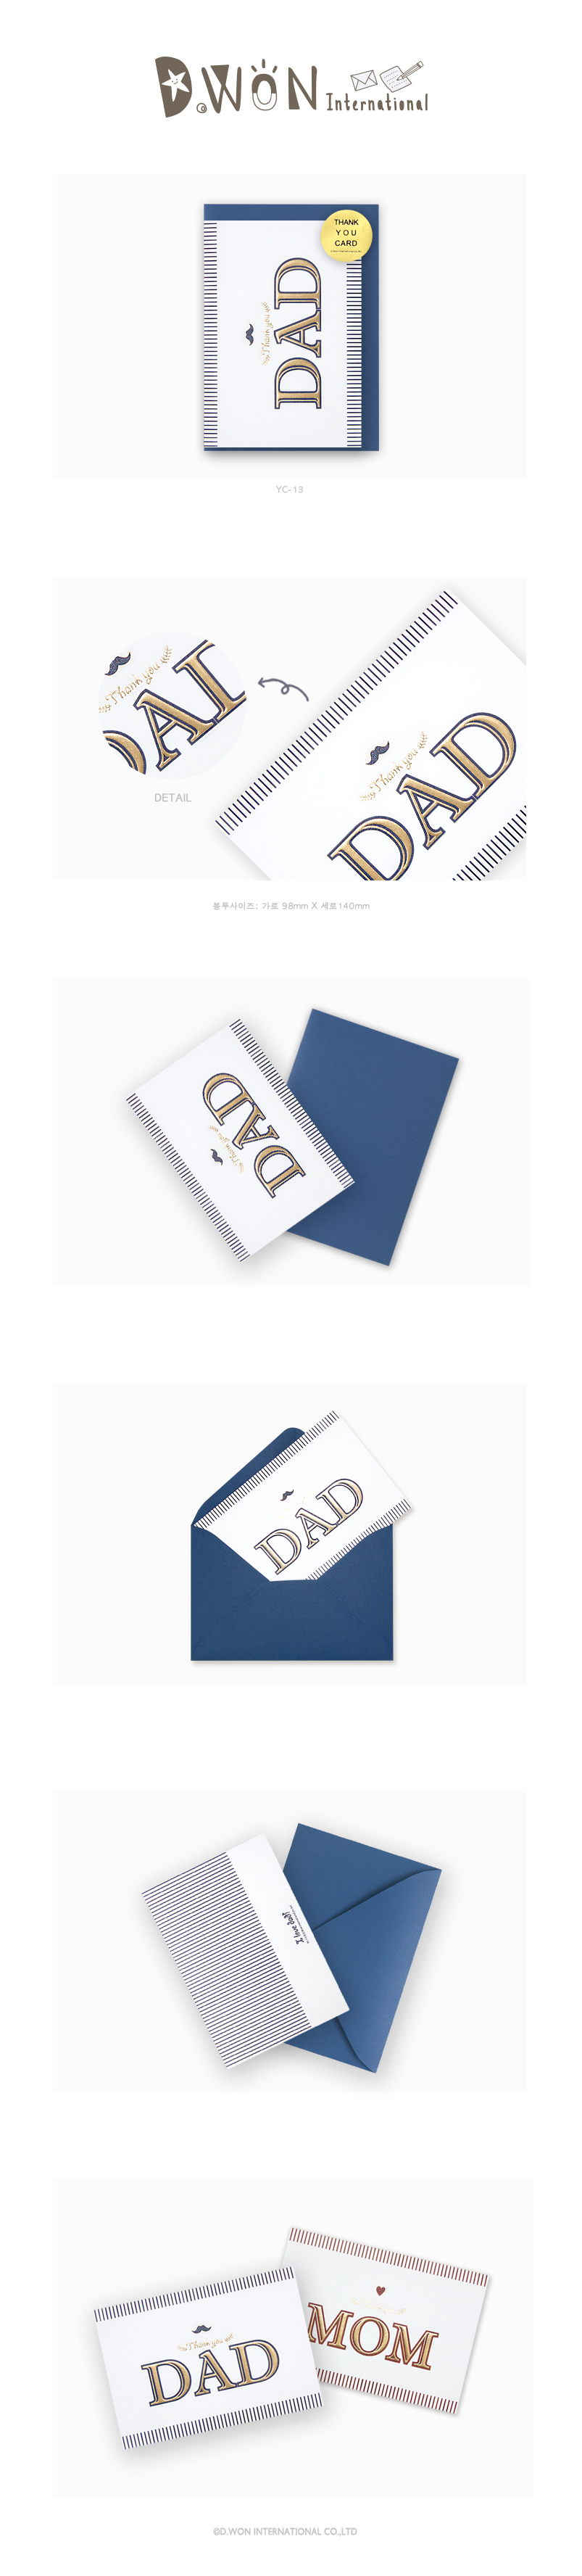 DAD 감사카드 YC-132,500원-디원디자인문구, 카드/편지/봉투, 카드, 감사 카드바보사랑DAD 감사카드 YC-132,500원-디원디자인문구, 카드/편지/봉투, 카드, 감사 카드바보사랑